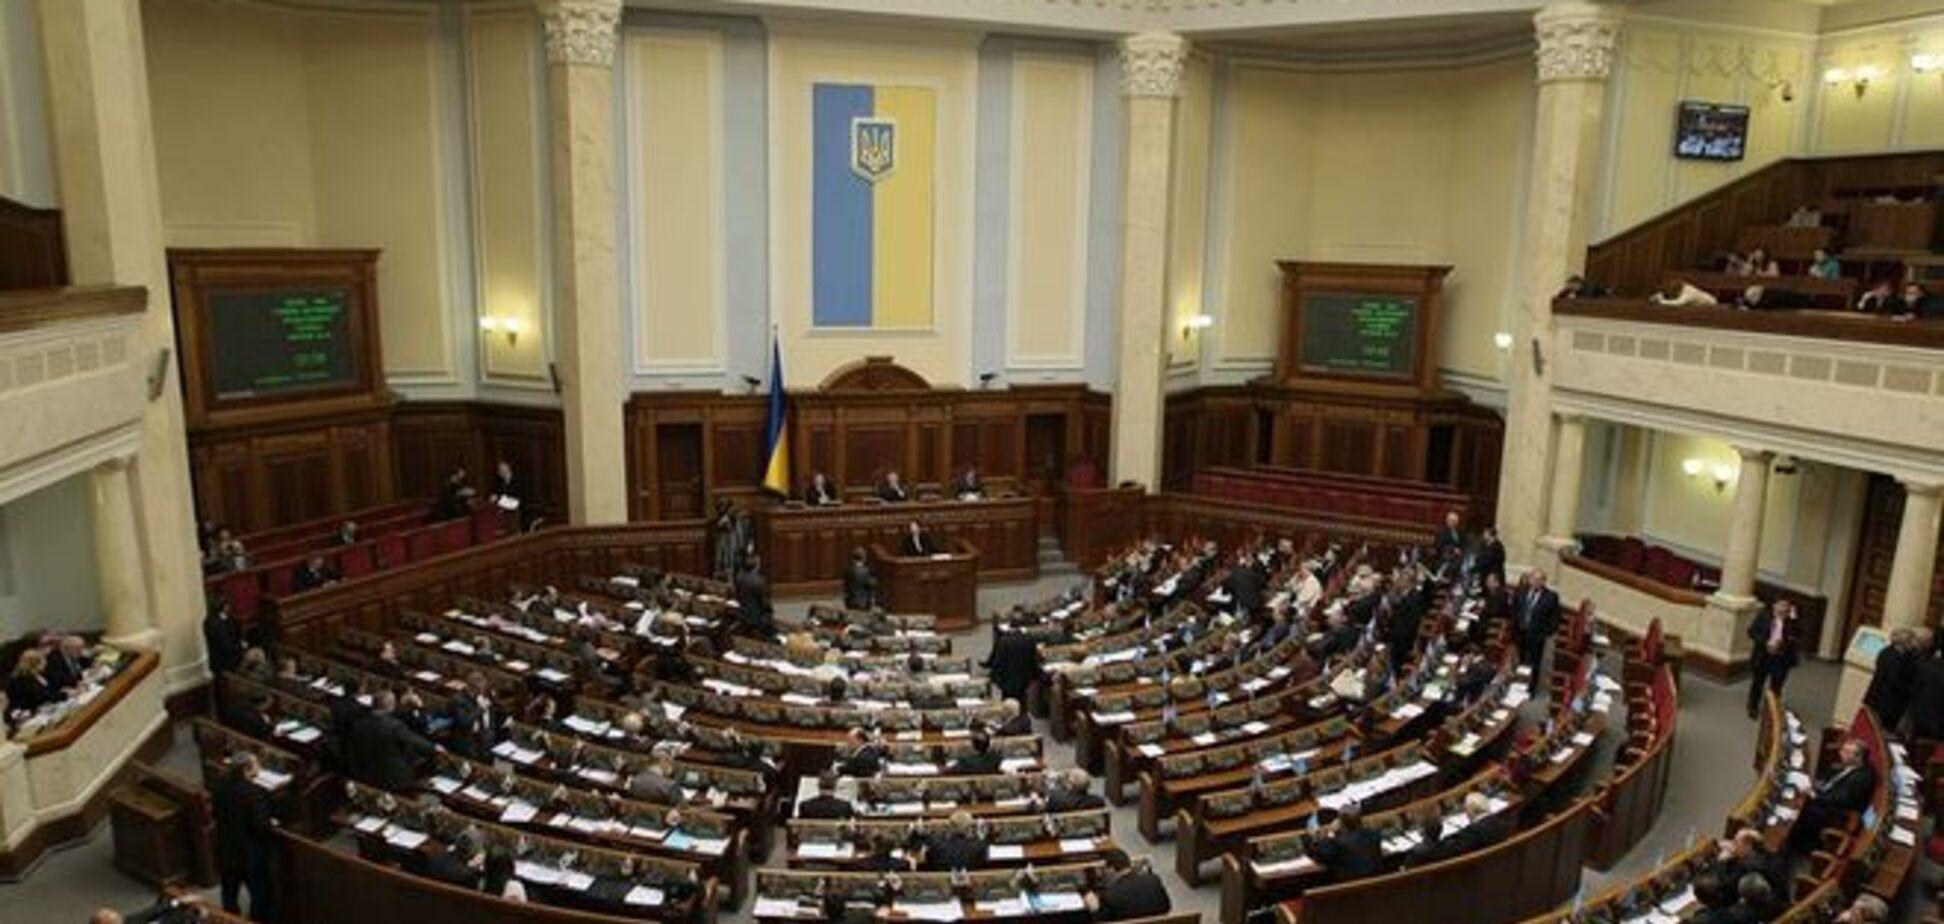 Рада закликала ООН, ЕП, ПАРЄ та ОБСЄ заступитися за права людини в Криму